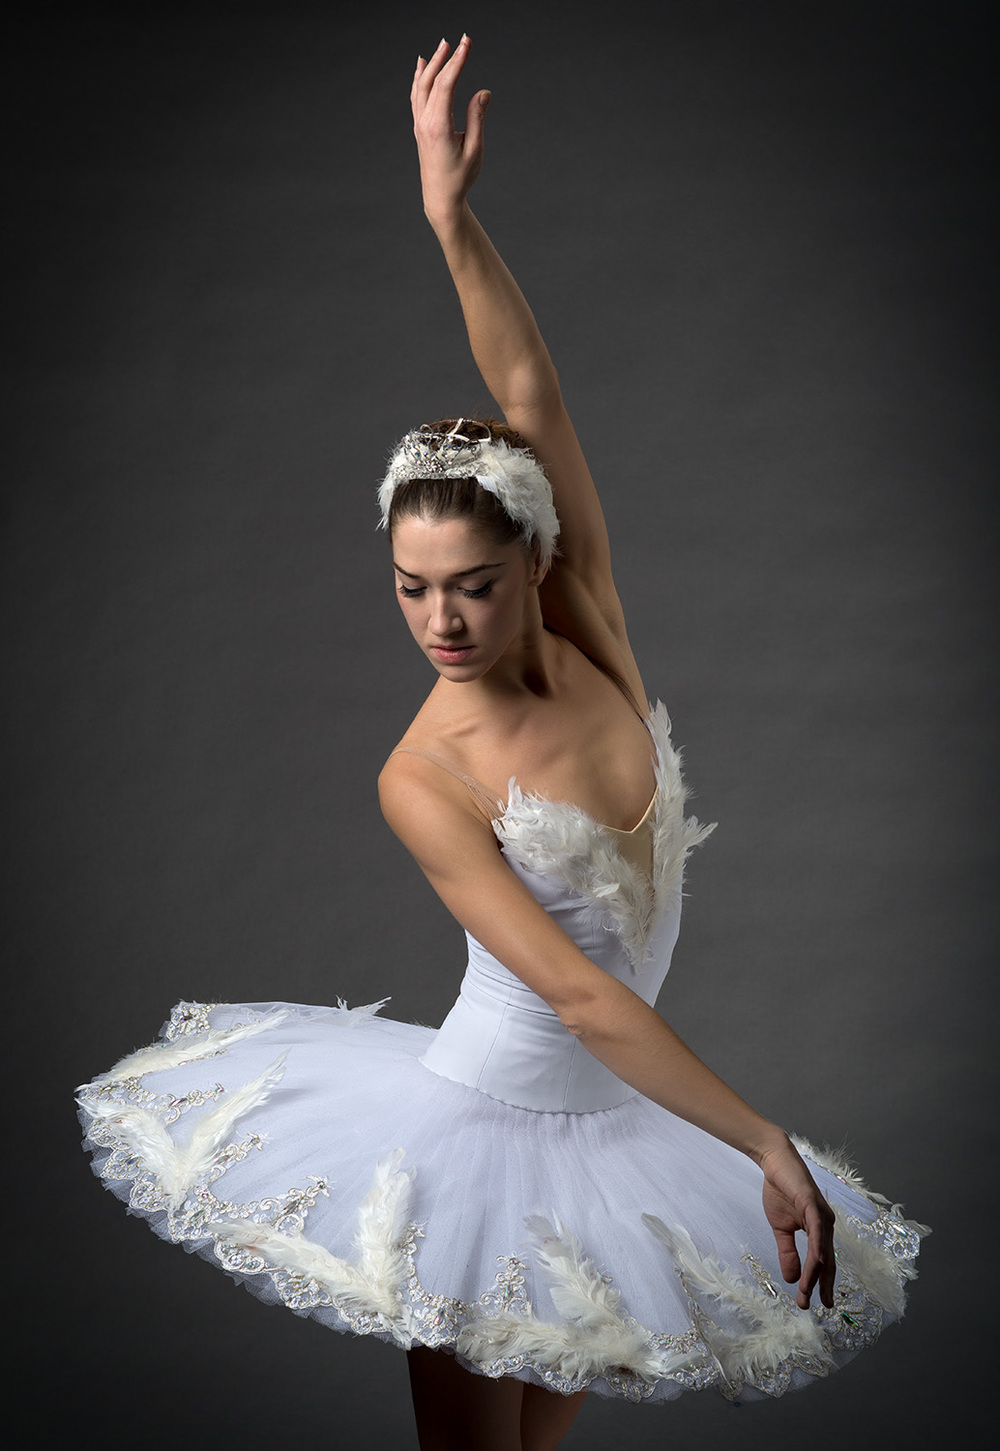 Tetyana Martyanova